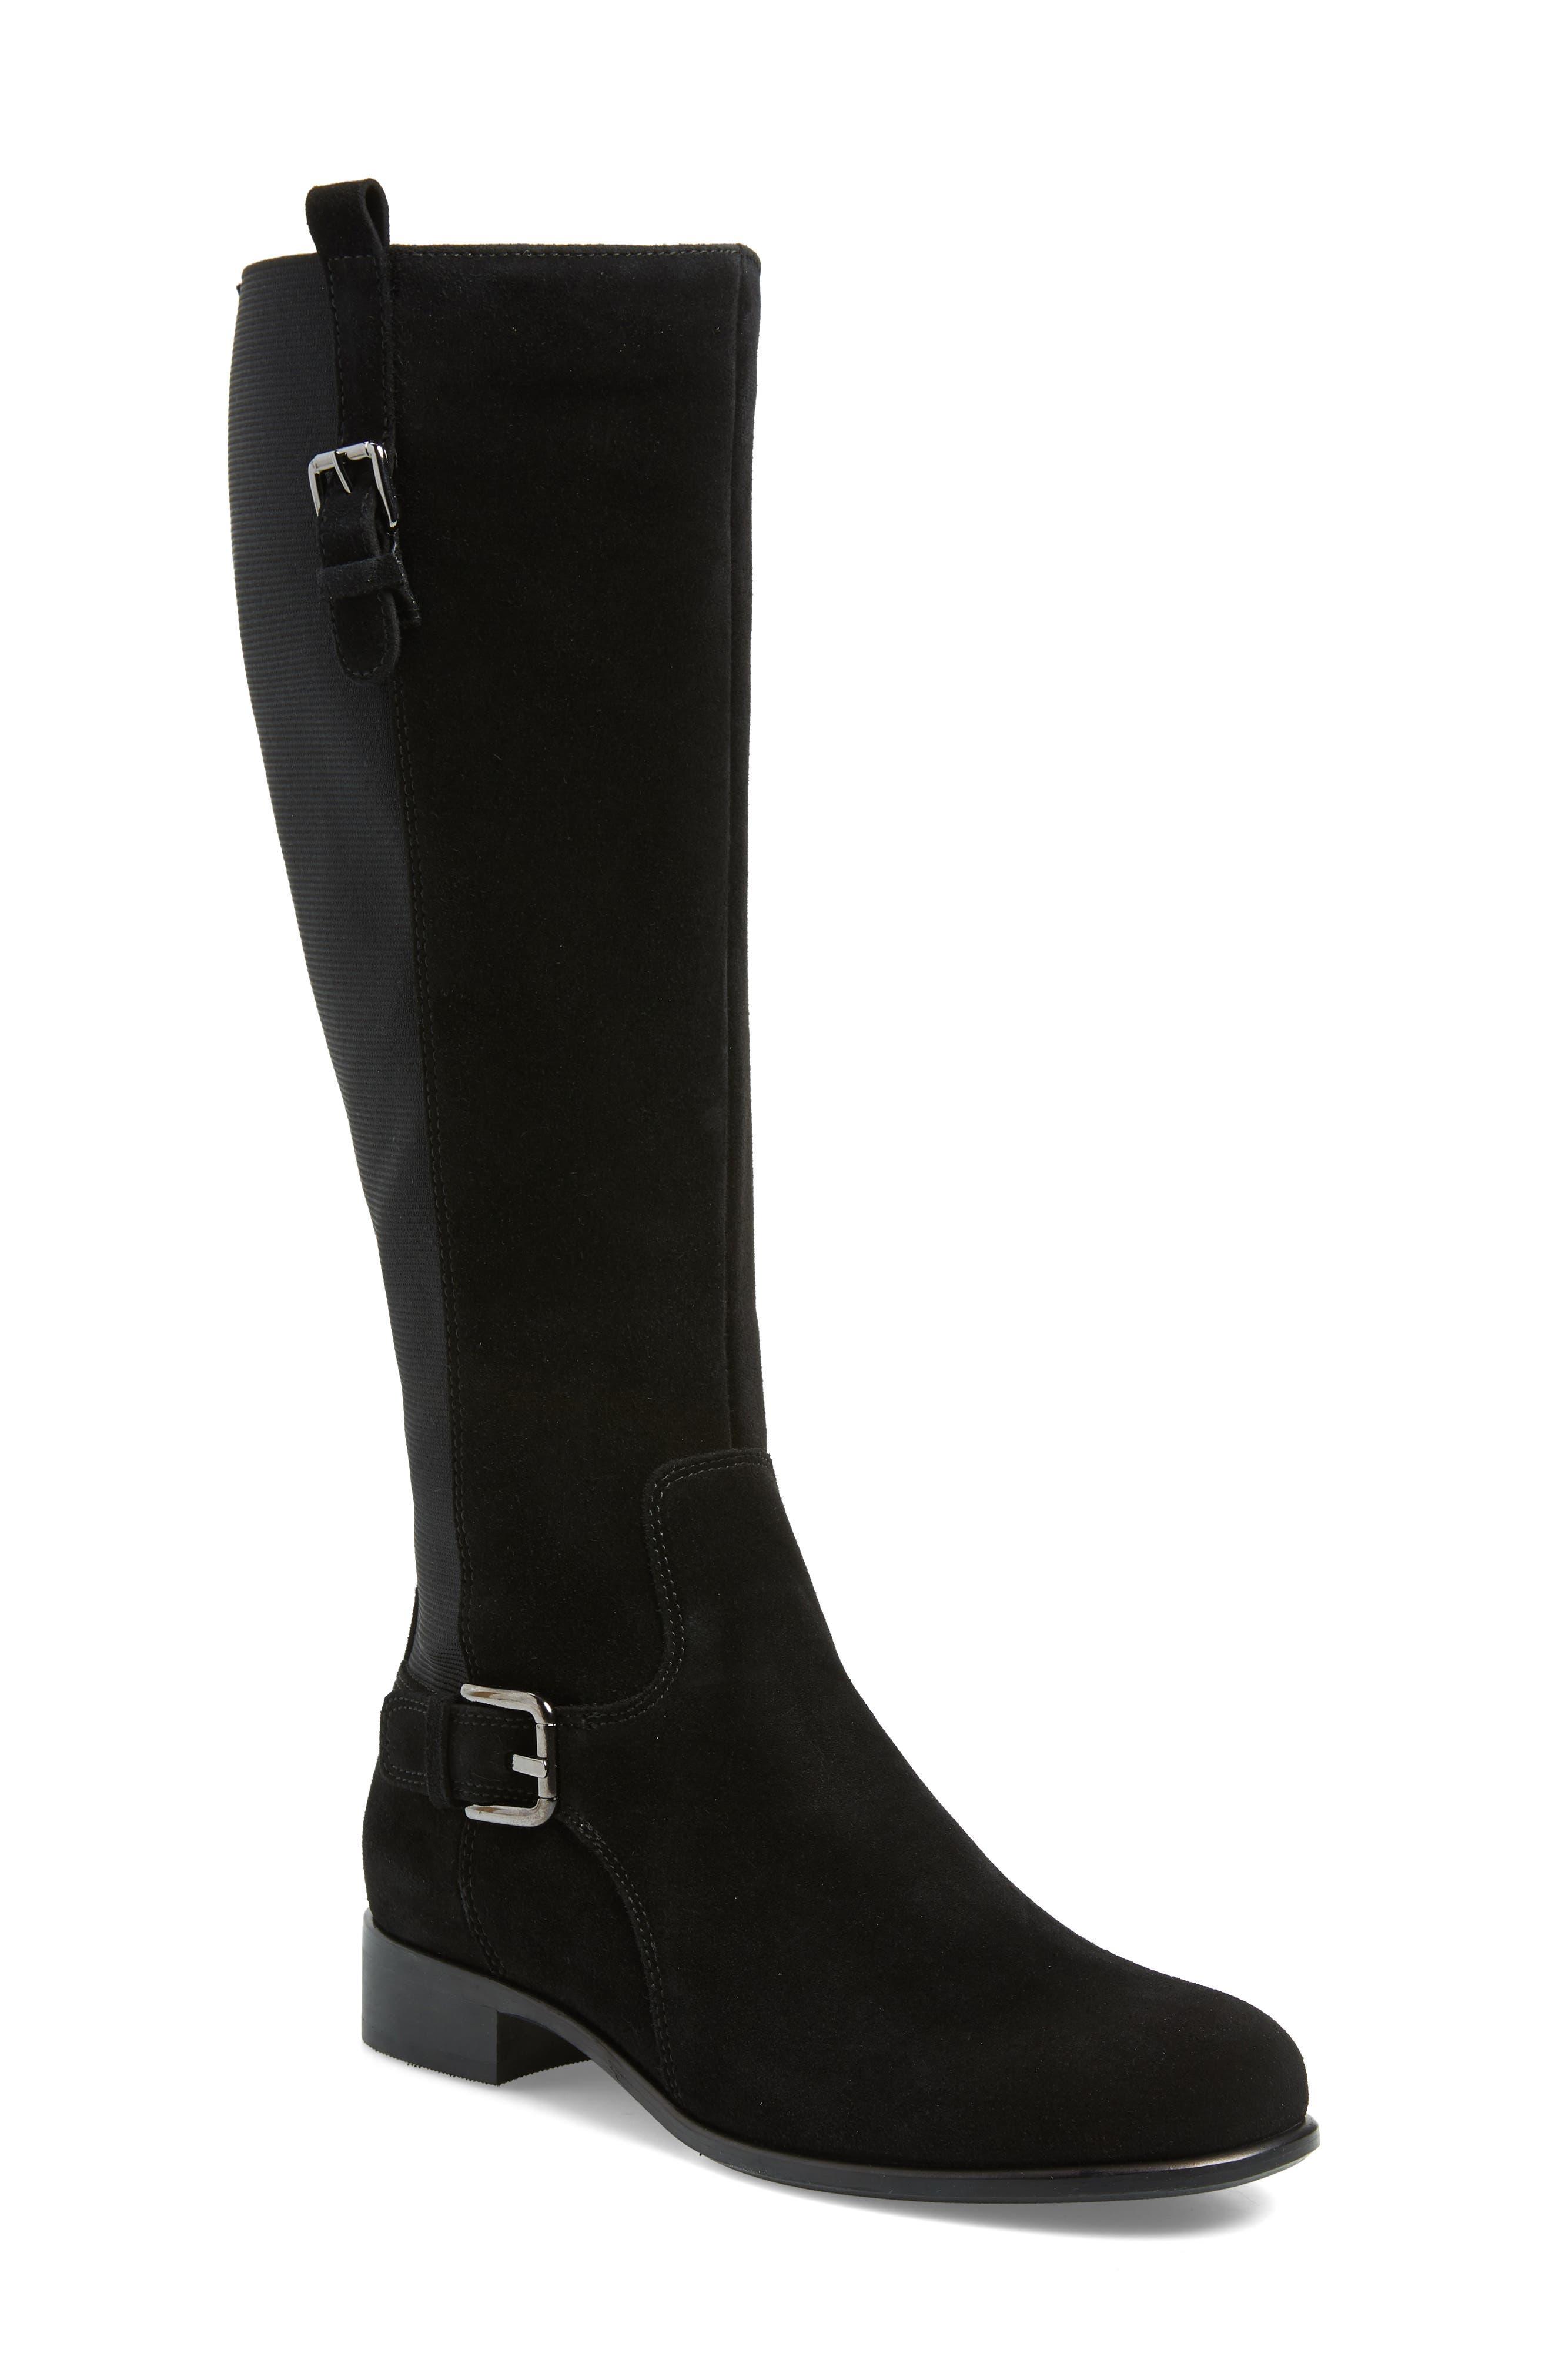 La Canadienne Samia Waterproof Knee High Boot (Women)